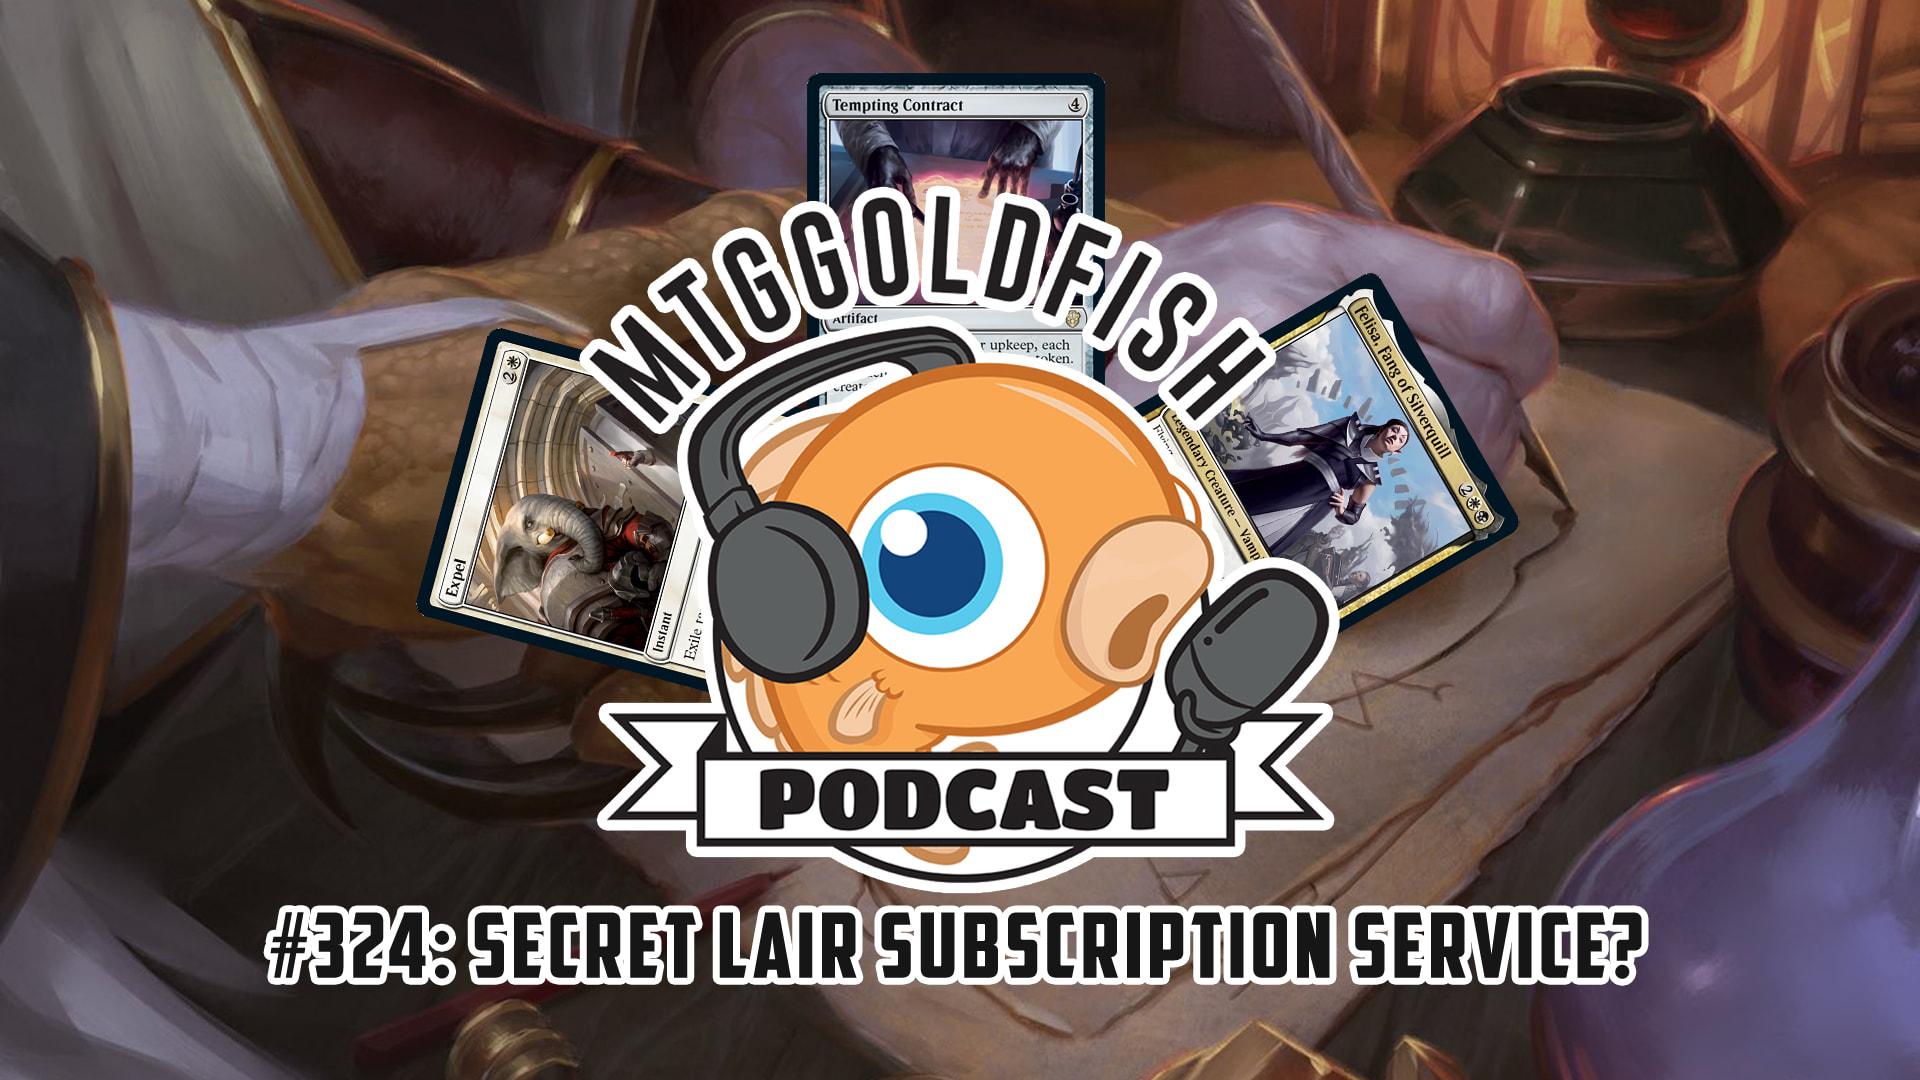 Image for Podcast 324: Secret Lair Subscription Service?